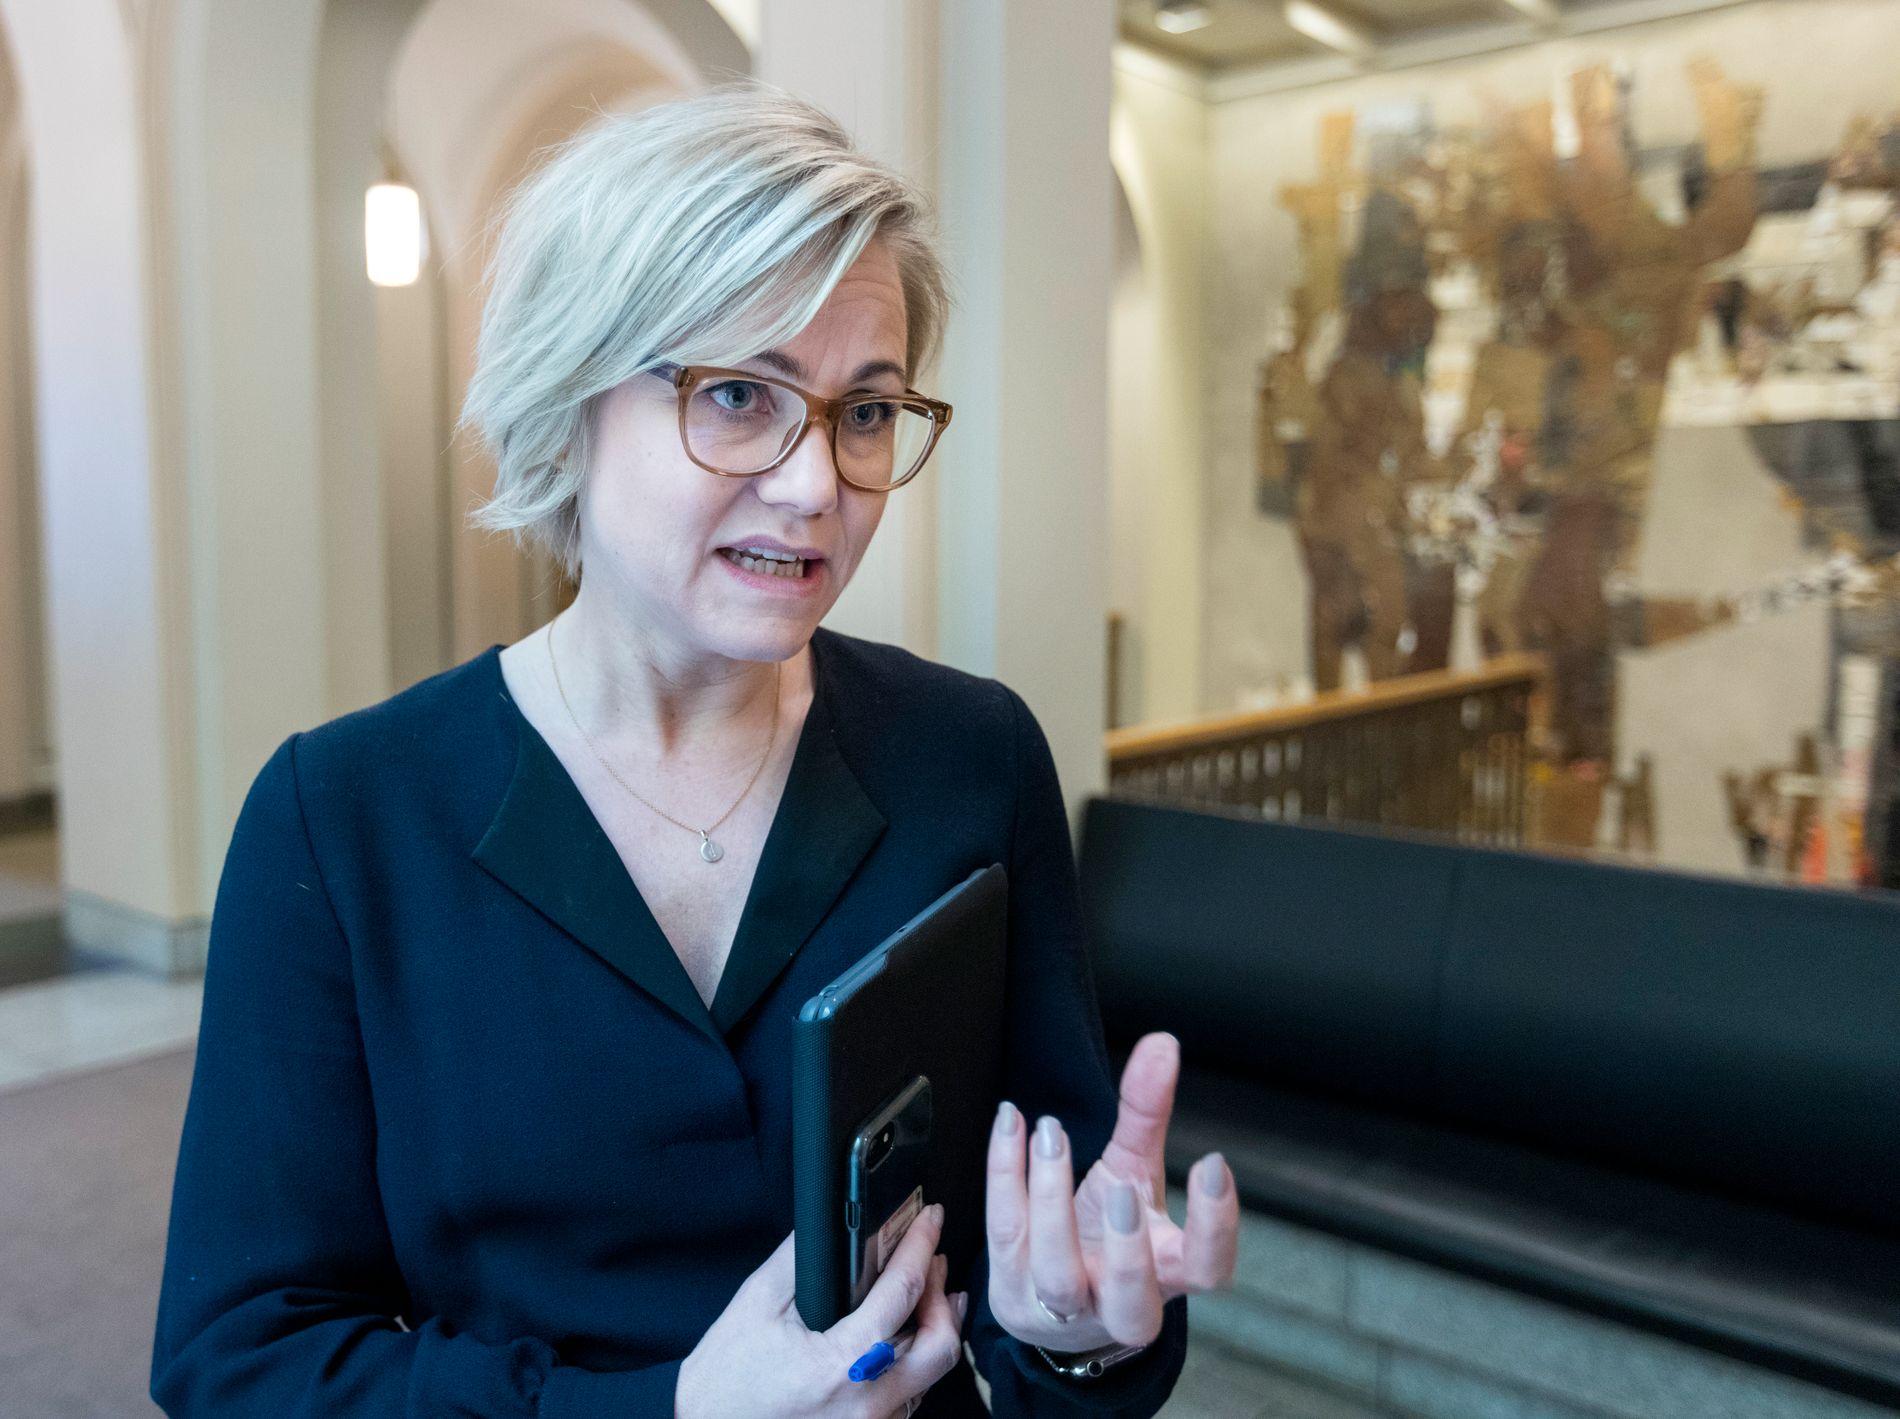 FORNØYD: Stortingsrepresentant Ingvild Kjerkol (Ap).